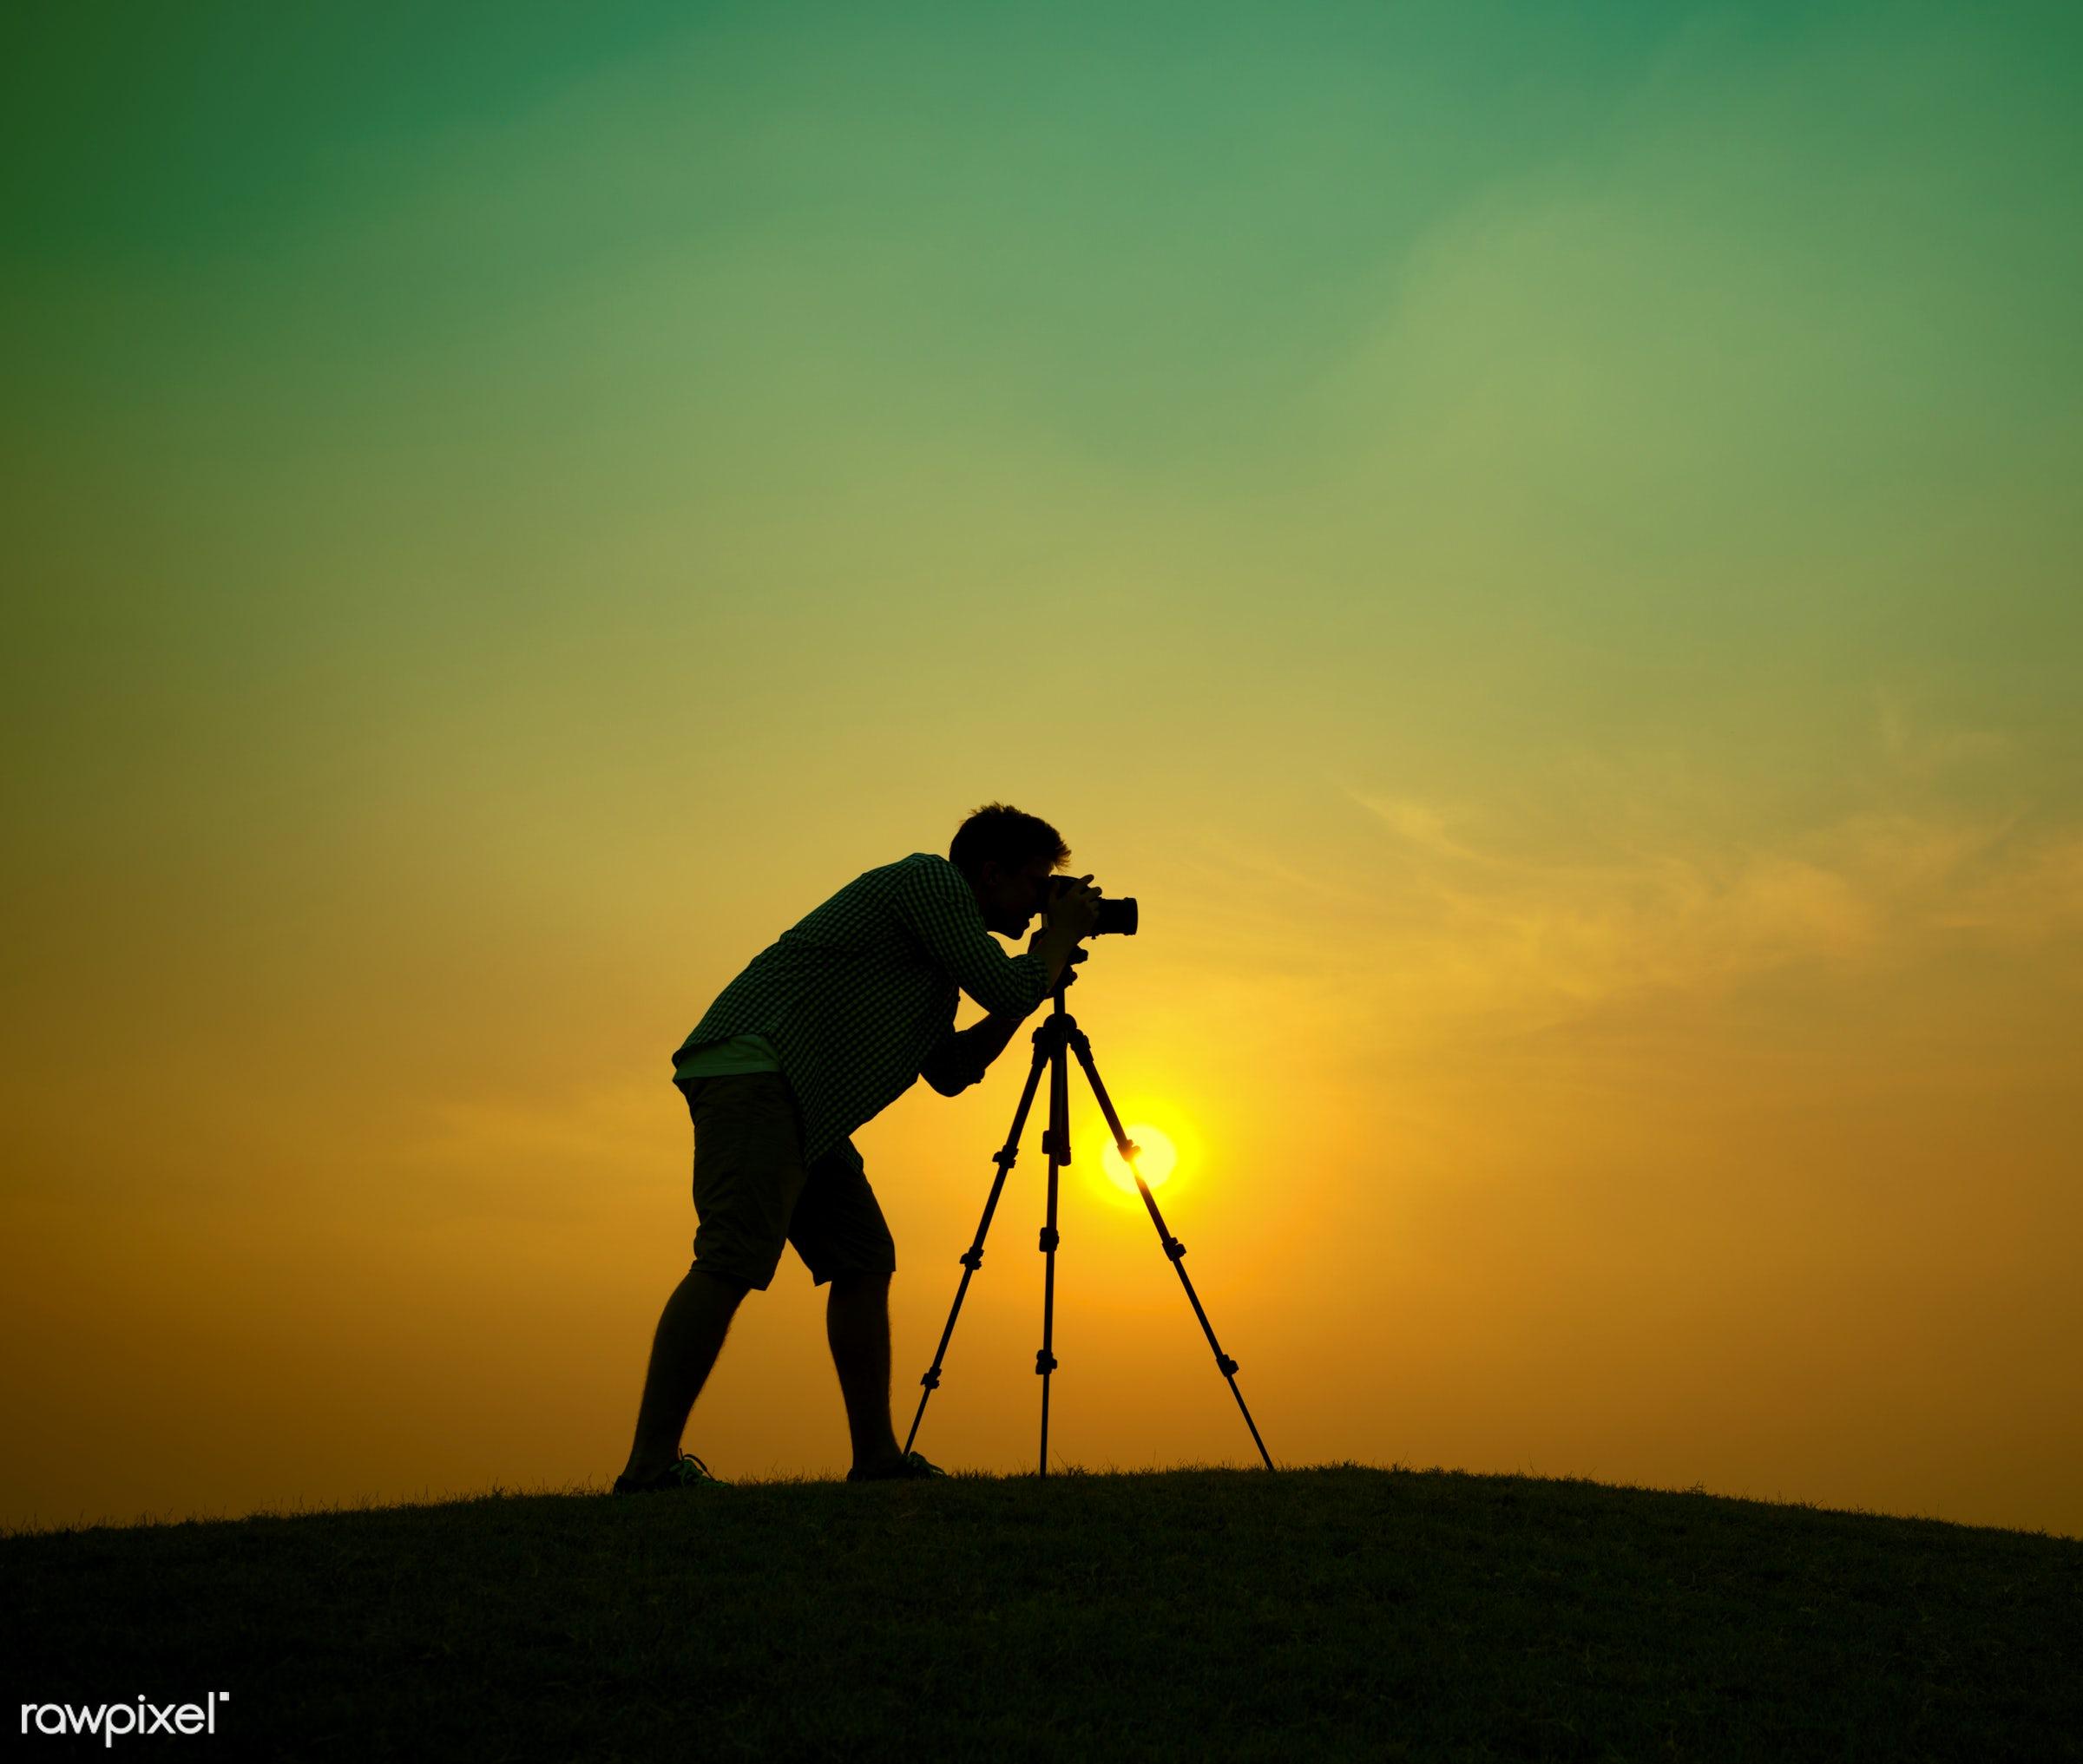 activity, adventure, alone, art, artist, camera, cameraman, colorful, concentration, concepts, creativity, dawn, evening,...